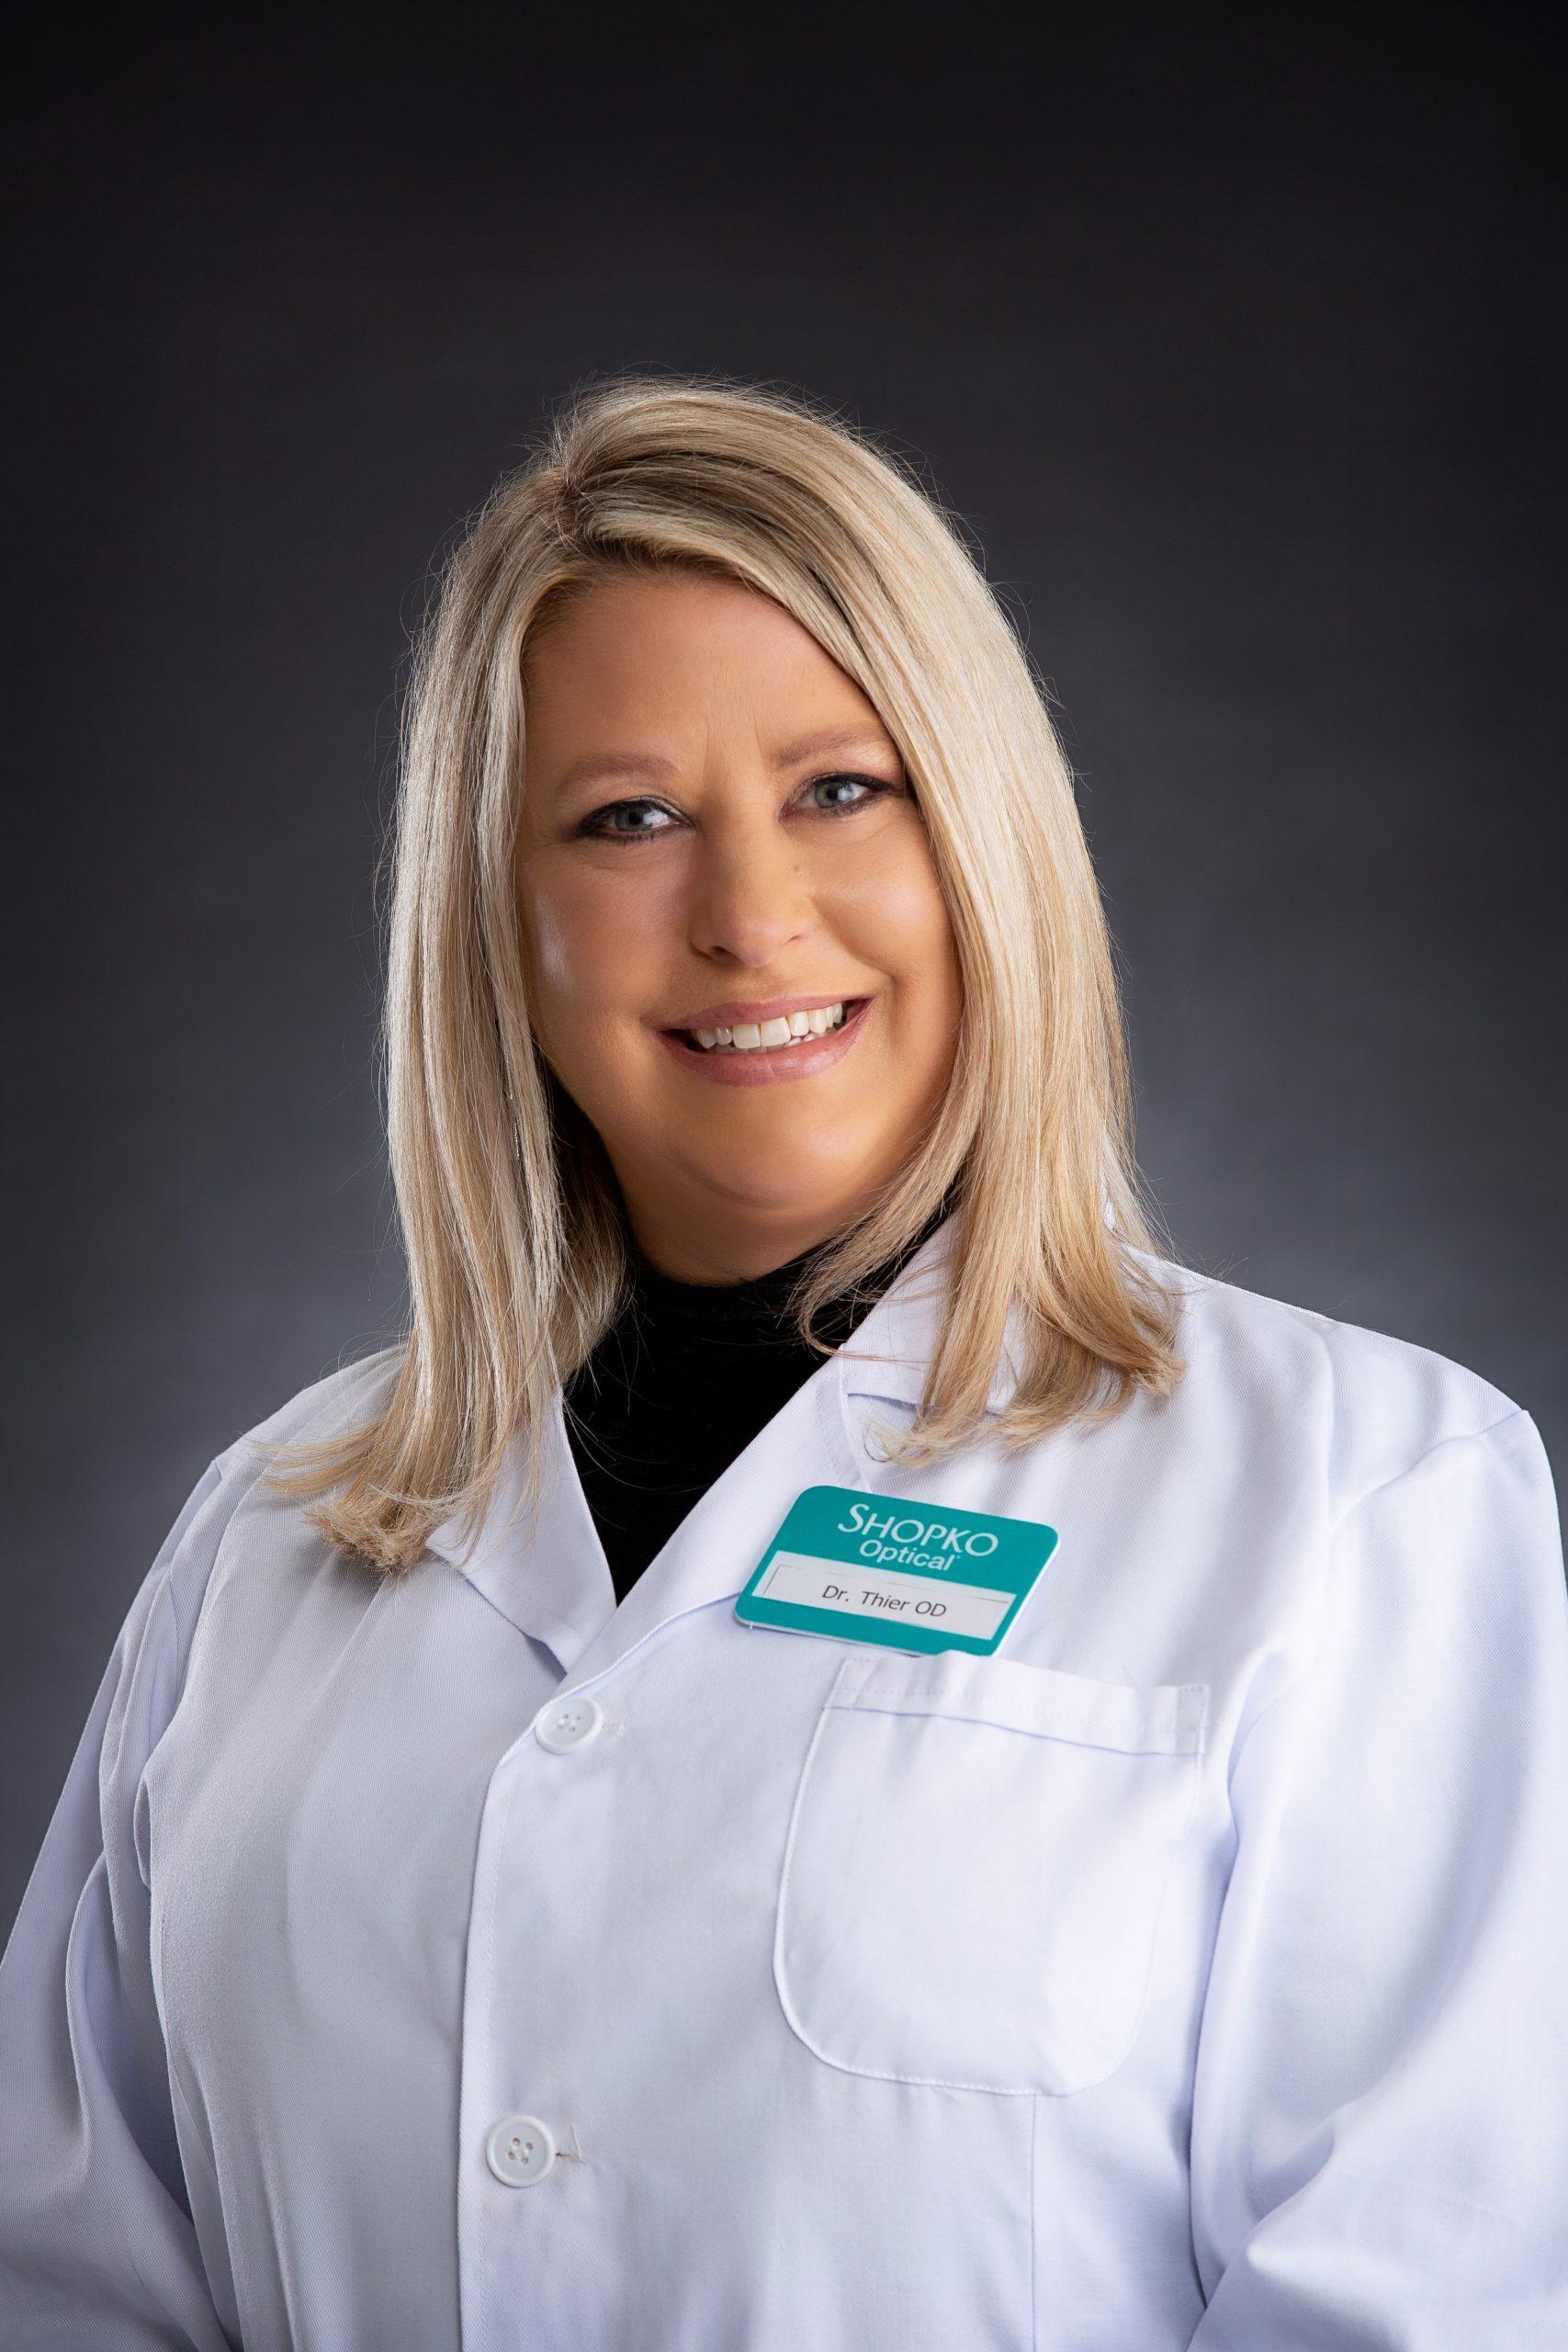 Dr. Thier- Shopko Optical optometrist